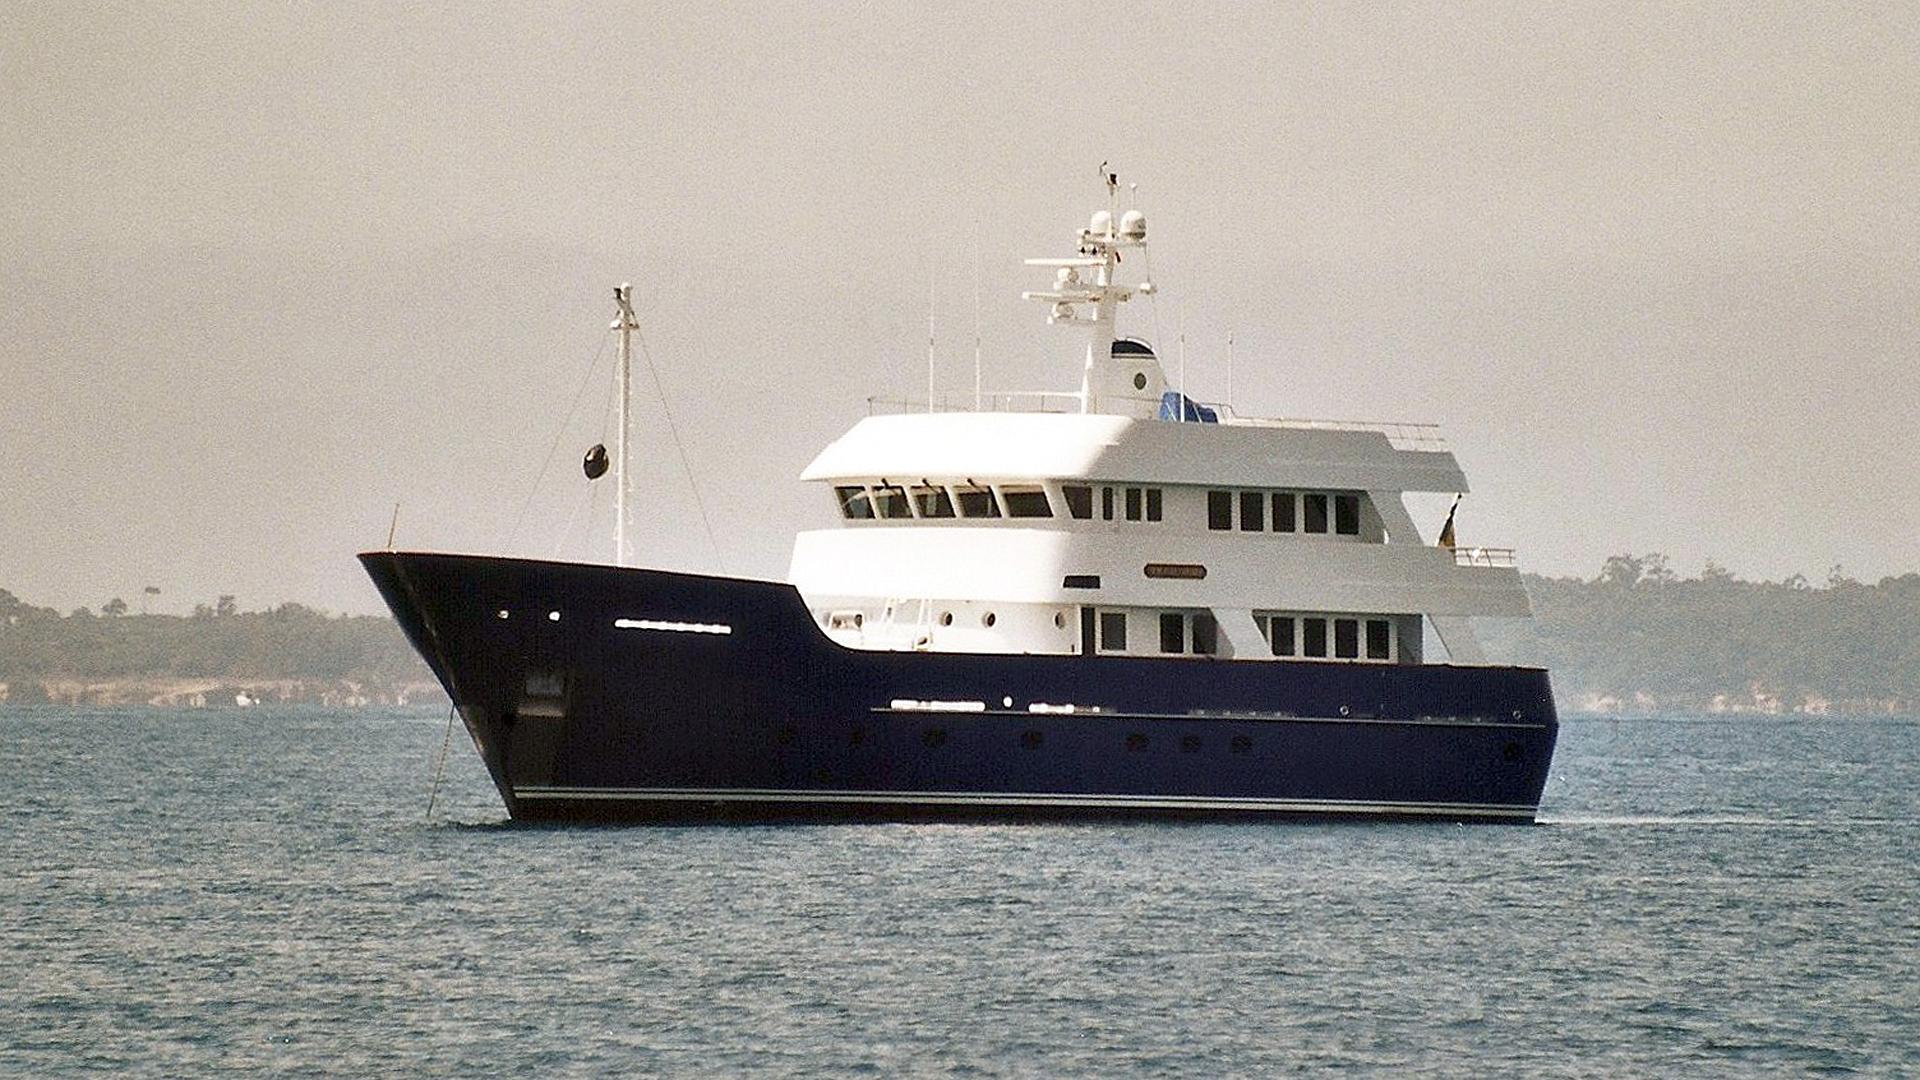 newcastle-explorer-yacht-marine-2001-31m-half-profile